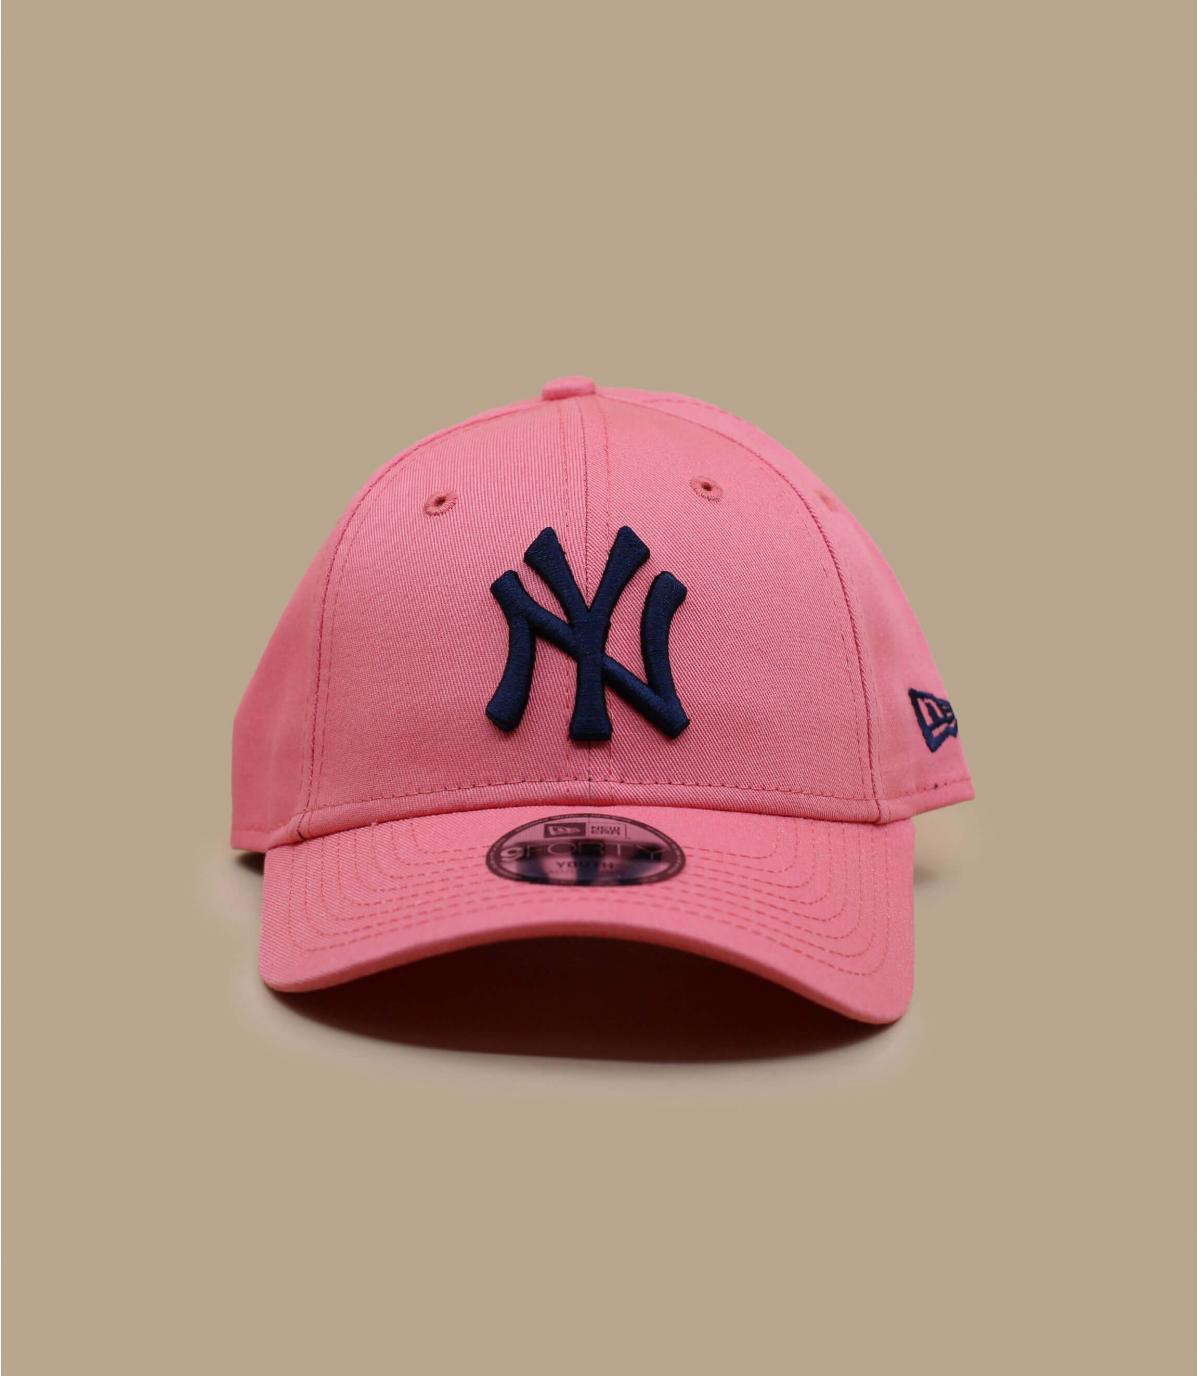 casquette NY enfant rose